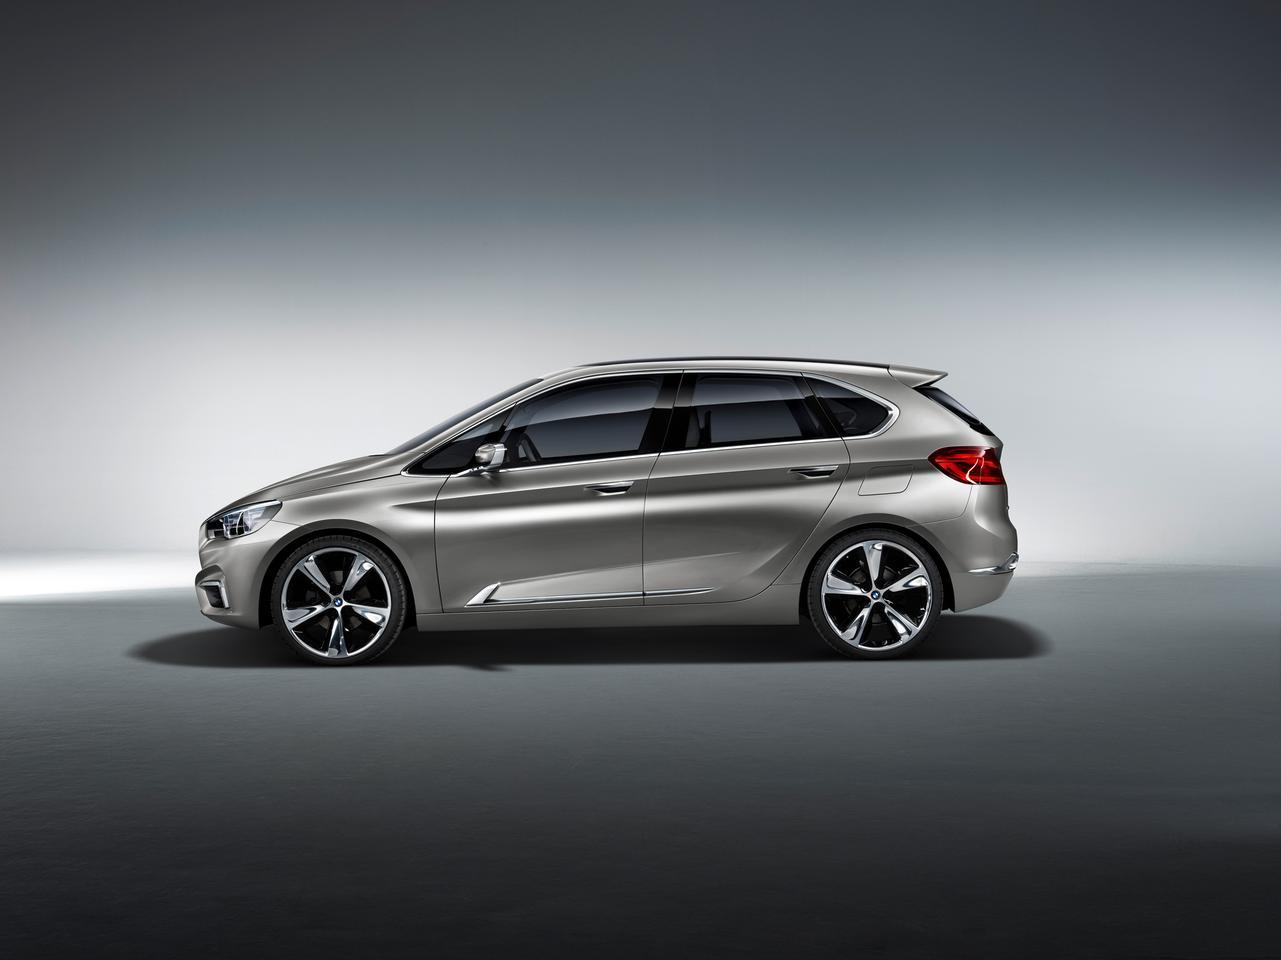 BMW Concept Active Tourer (Image: BMW)